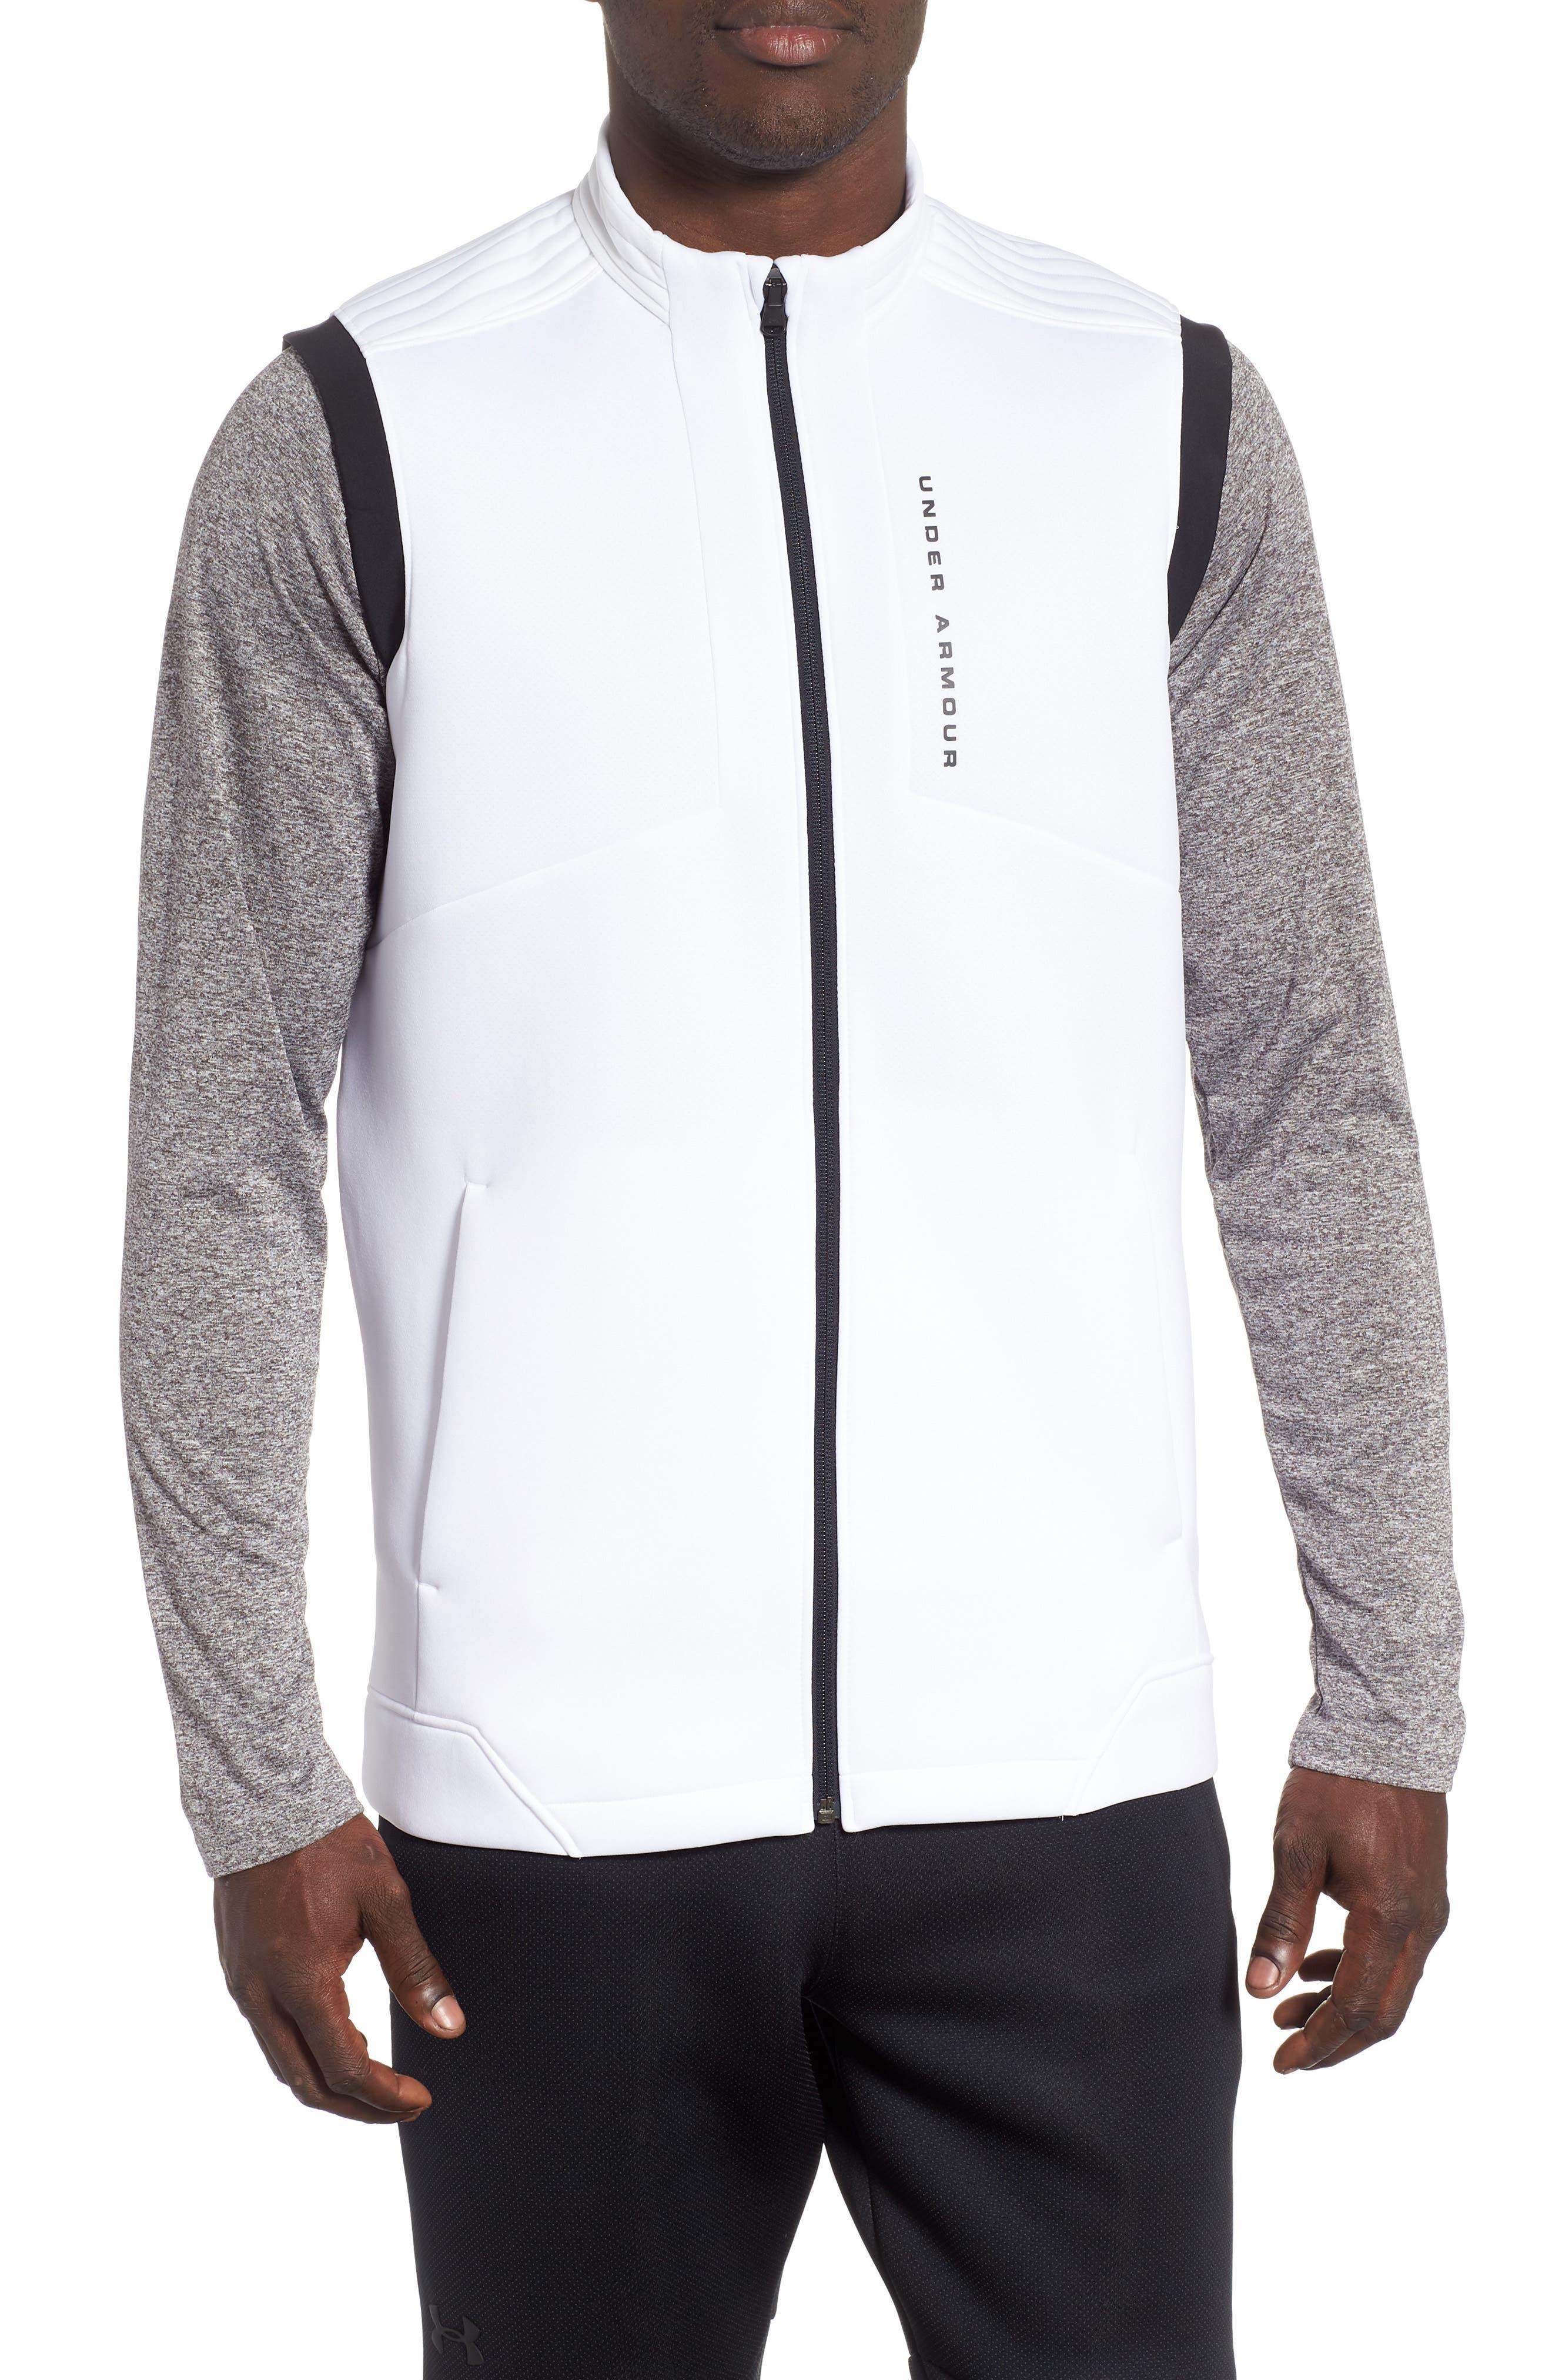 Storm Daytona Vest,                         Main,                         color, WHITE/ BLACK/ BLACK